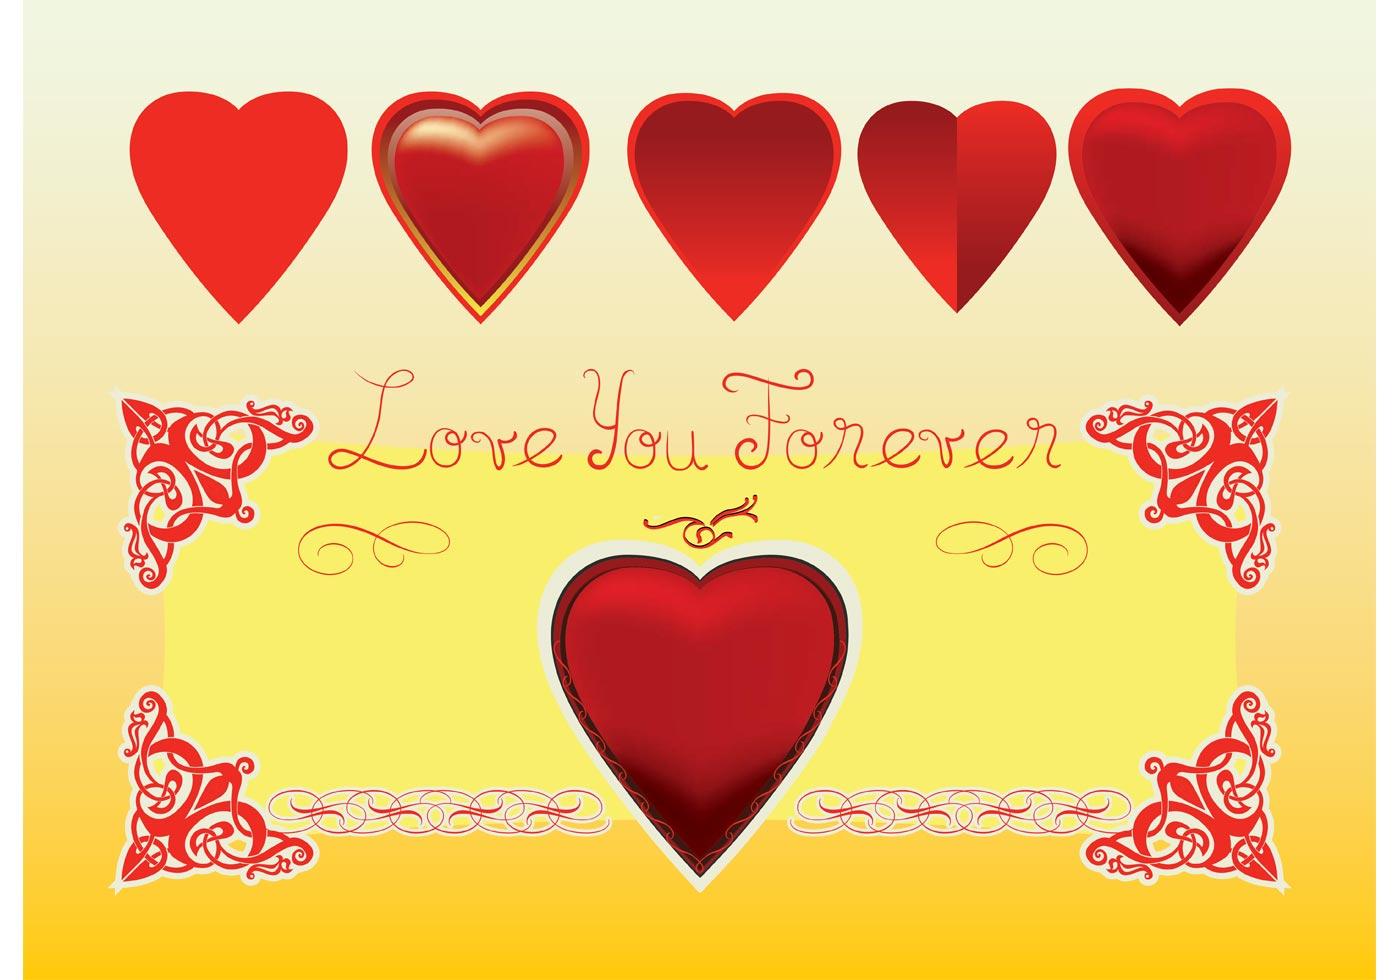 I Love You Imágenes De Stock I Love You Fotos De Stock